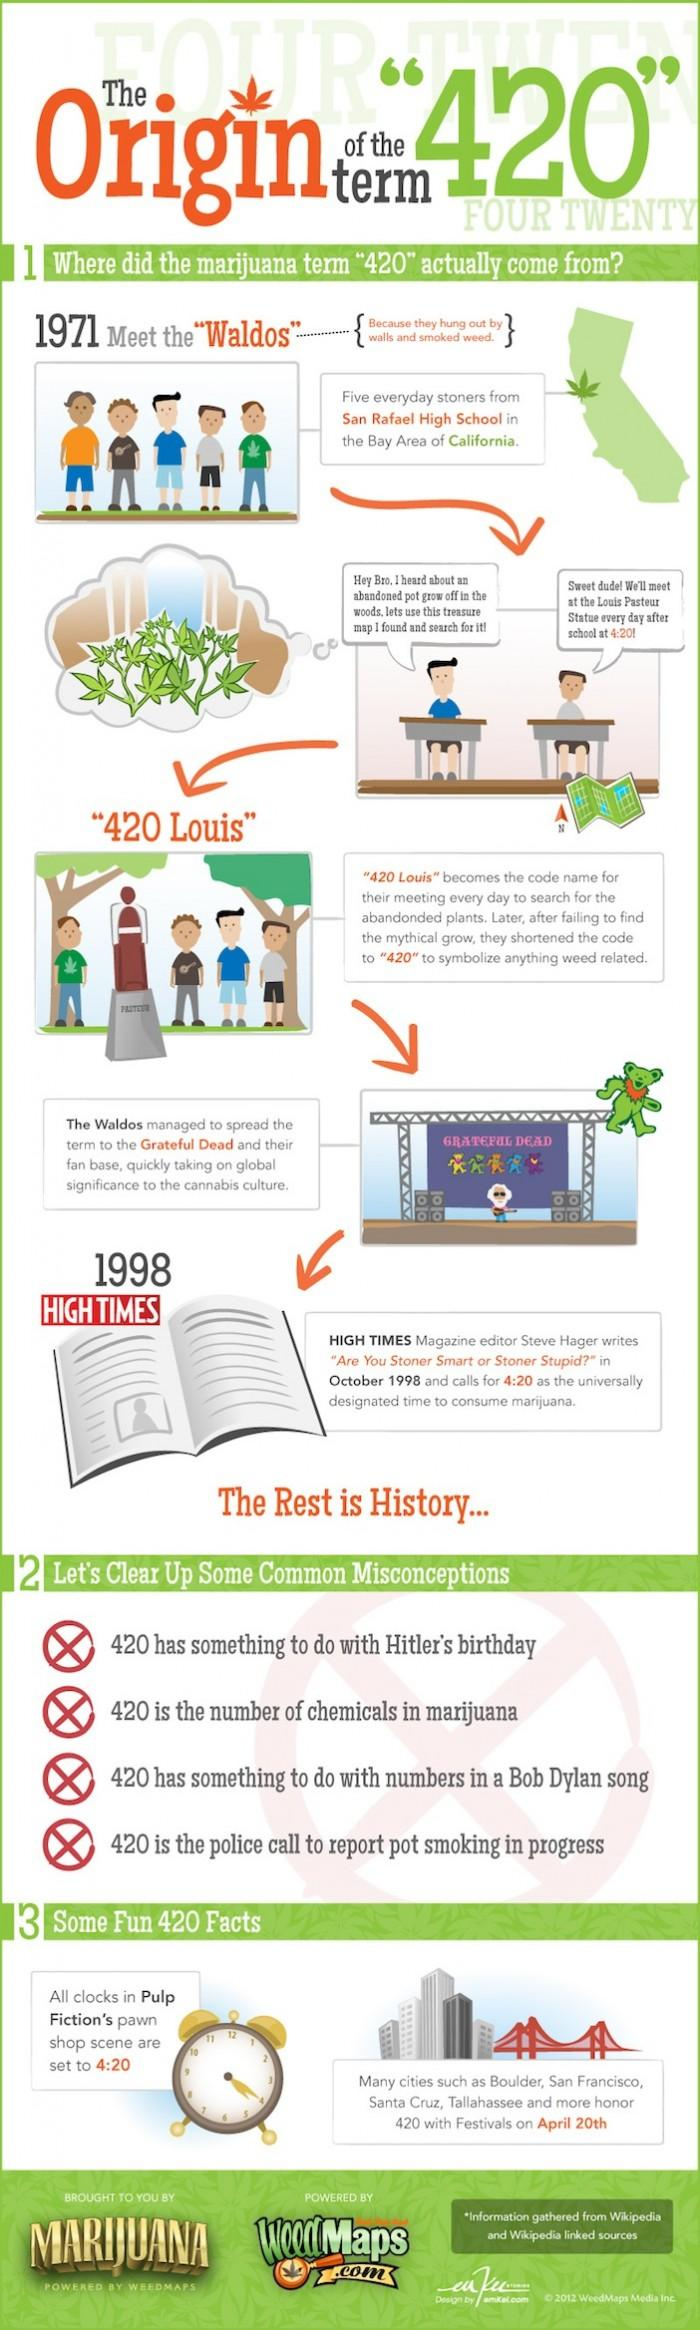 The Origin Of The Term 420